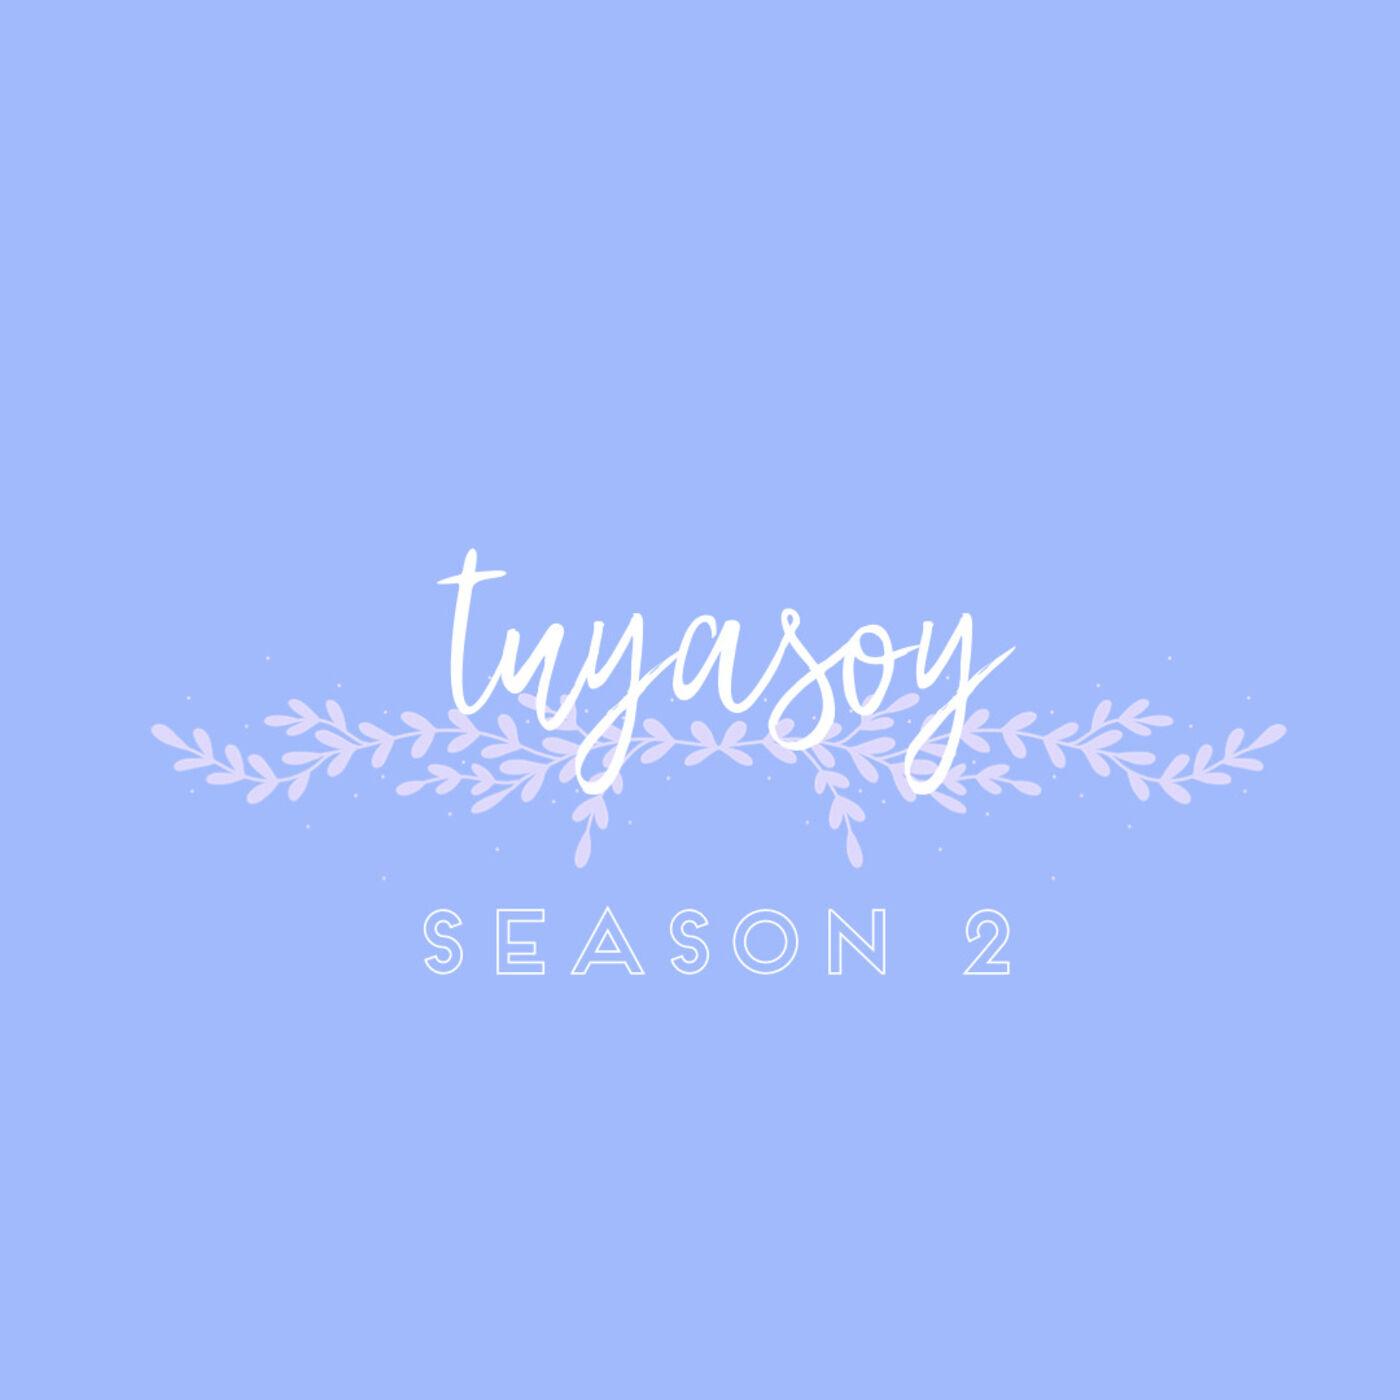 Bienvenidos a Tuya Soy Podcast!